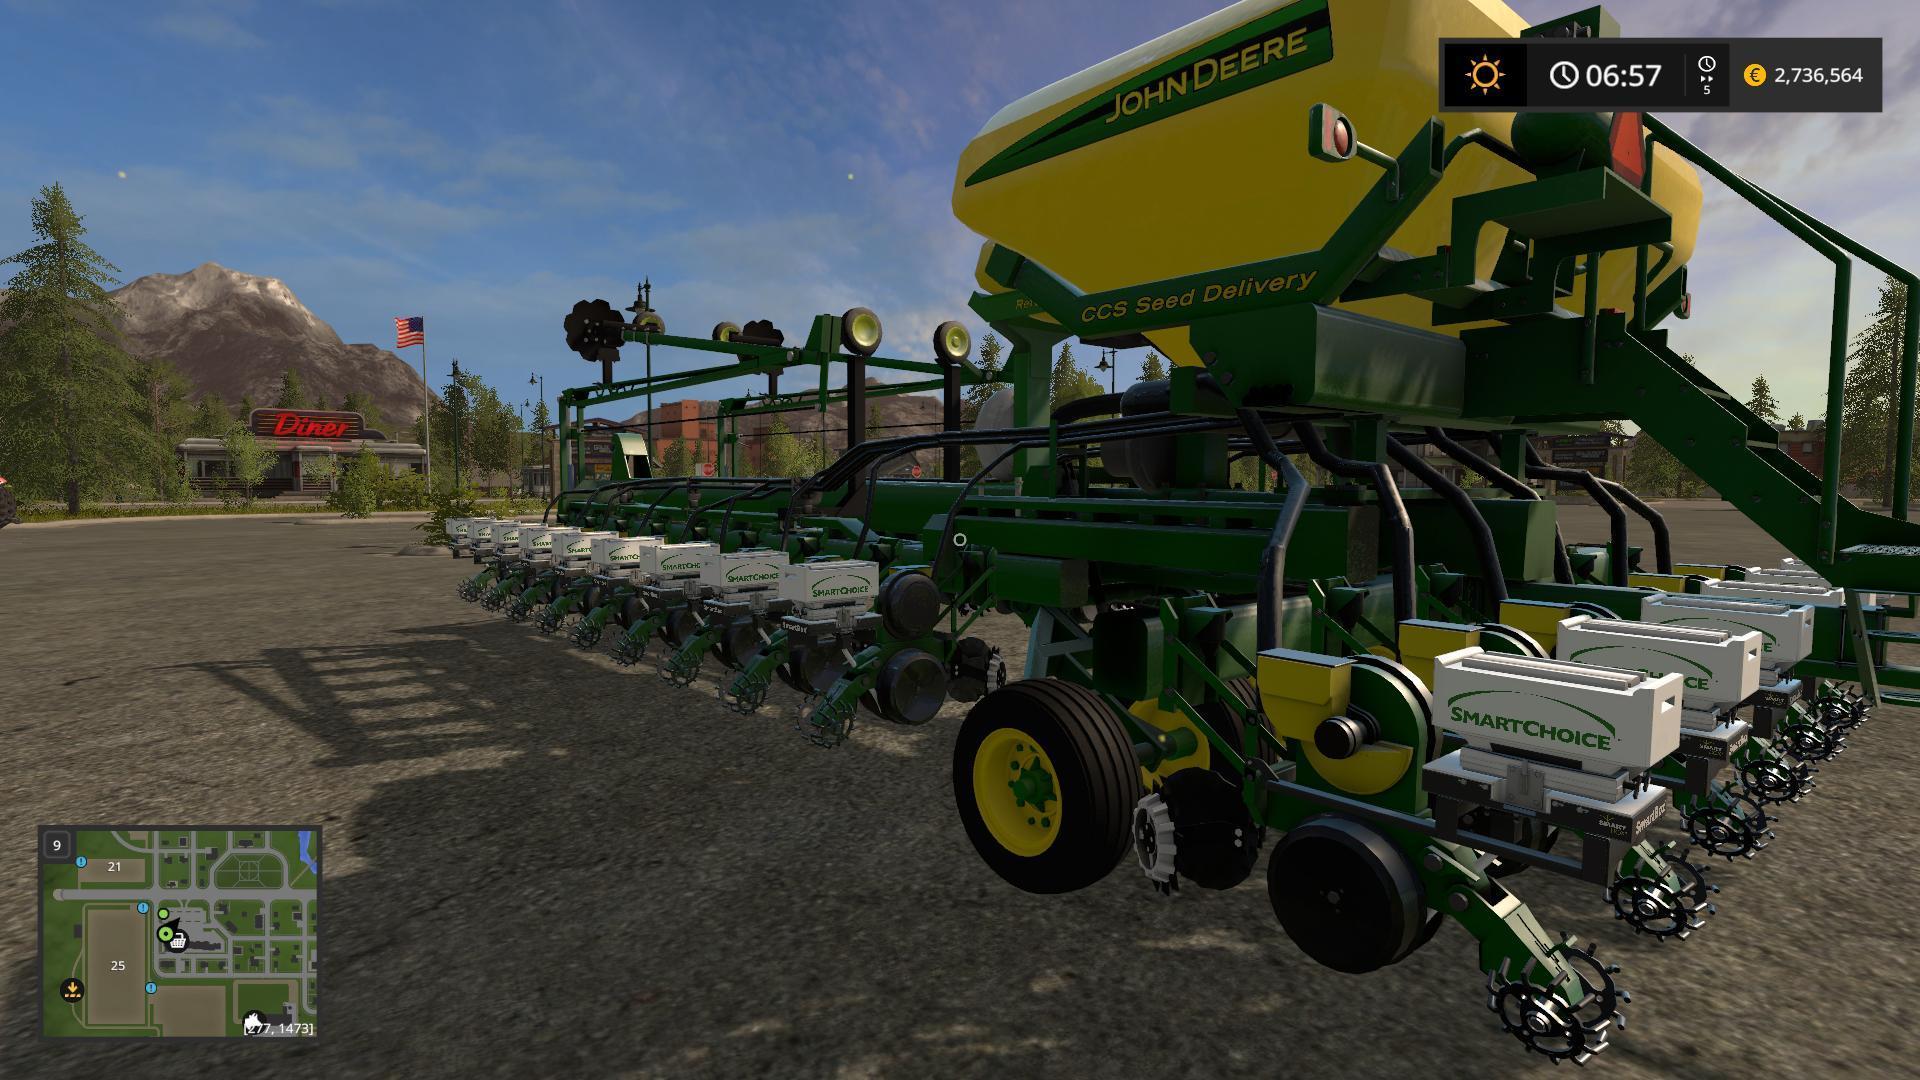 JOHNDEERE DB60 V5 0 0 FS17 - Farming Simulator 2017 mod, FS 17 mod